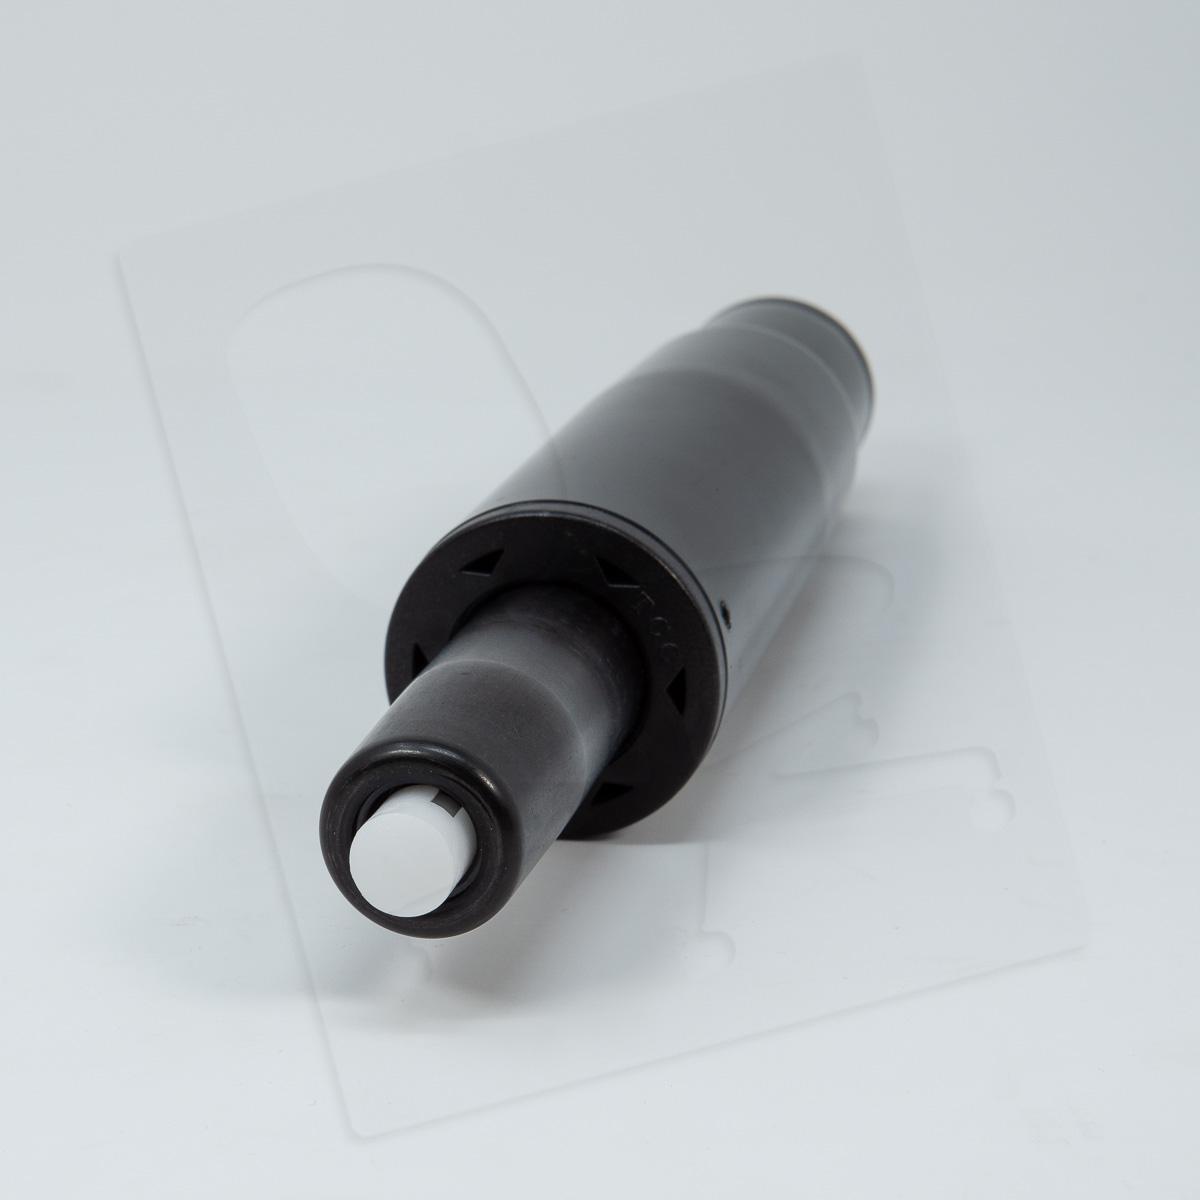 Crandall Office Furniture Aftermarket Haworth Improv 8 inch Stool Gas Cylinder 0002